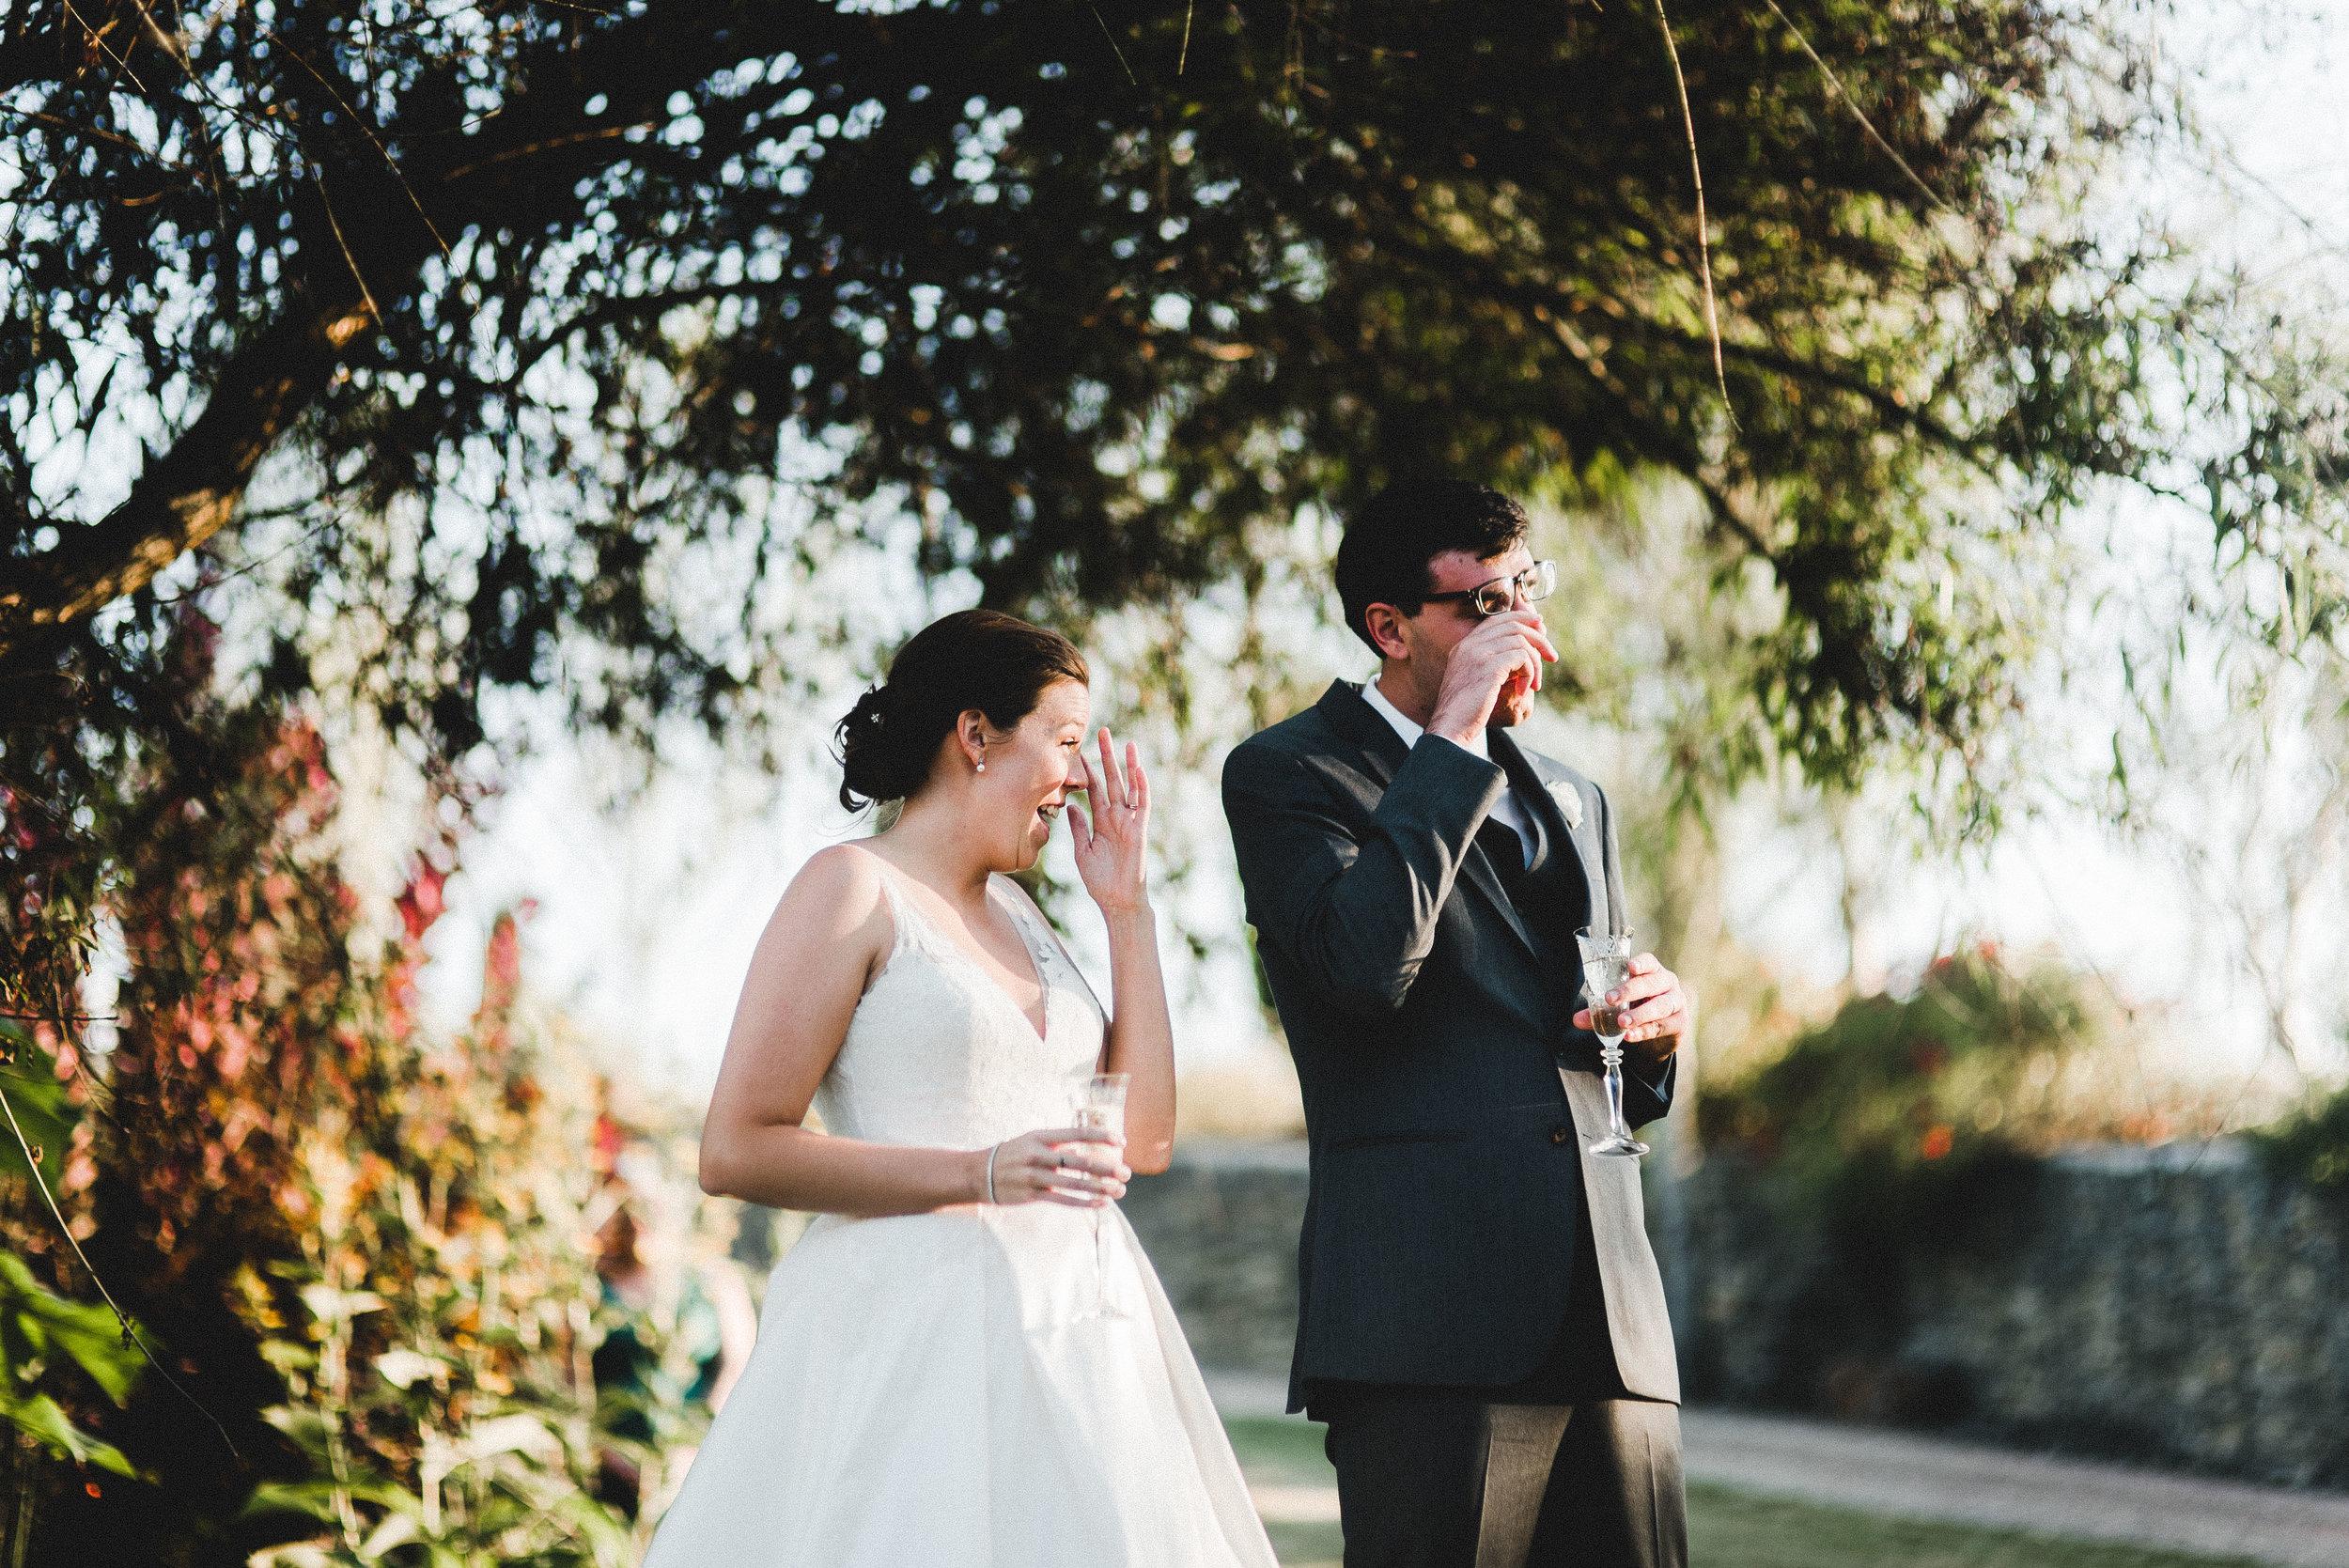 Bridalbliss.com | Portland Wedding | Oregon Event Planning and Design | Amanda Marie Studio